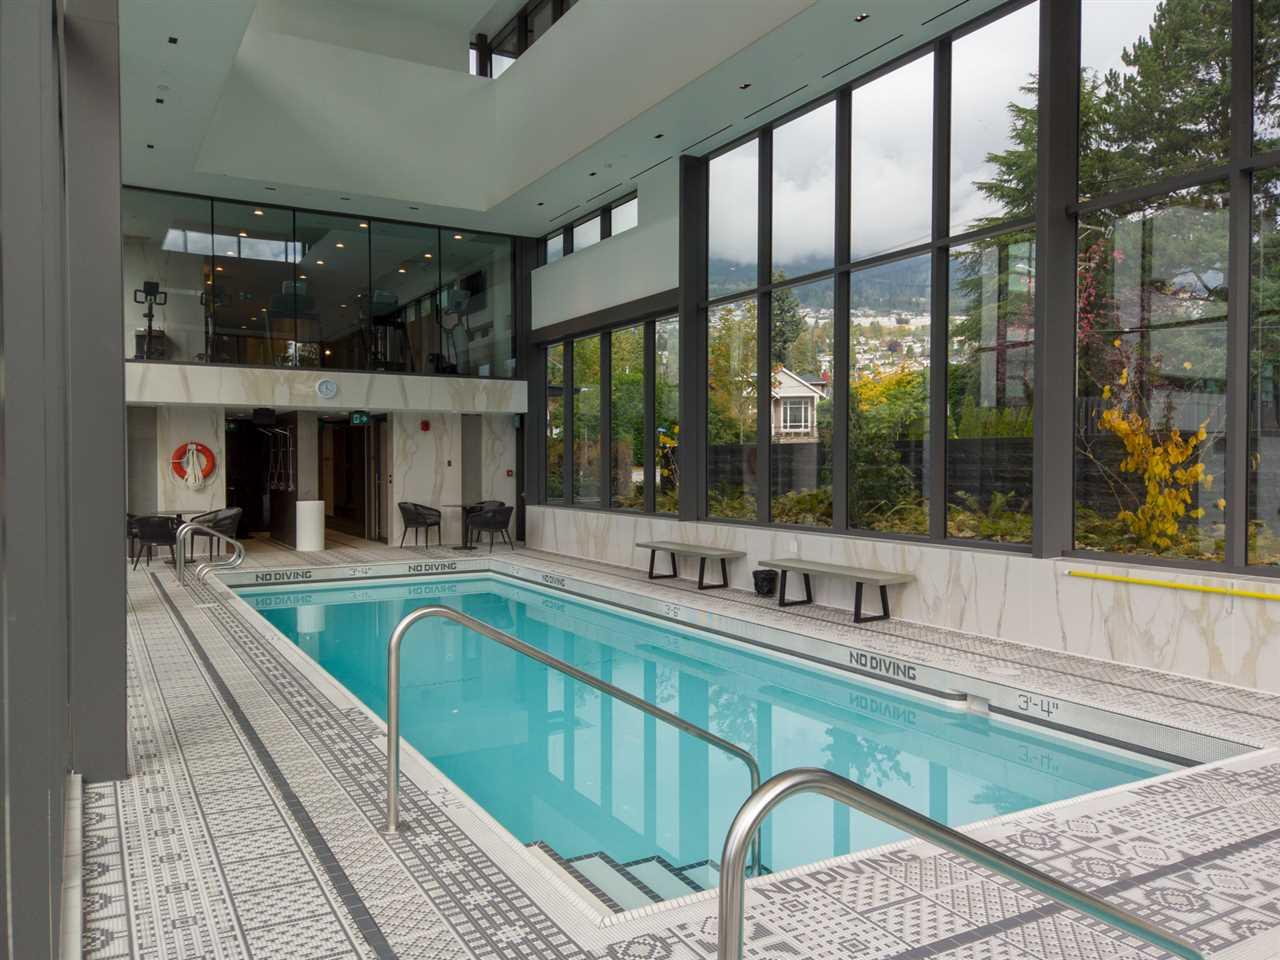 TH1 2289 BELLEVUE AVENUE - Ambleside Townhouse for sale, 3 Bedrooms (R2543975) - #21